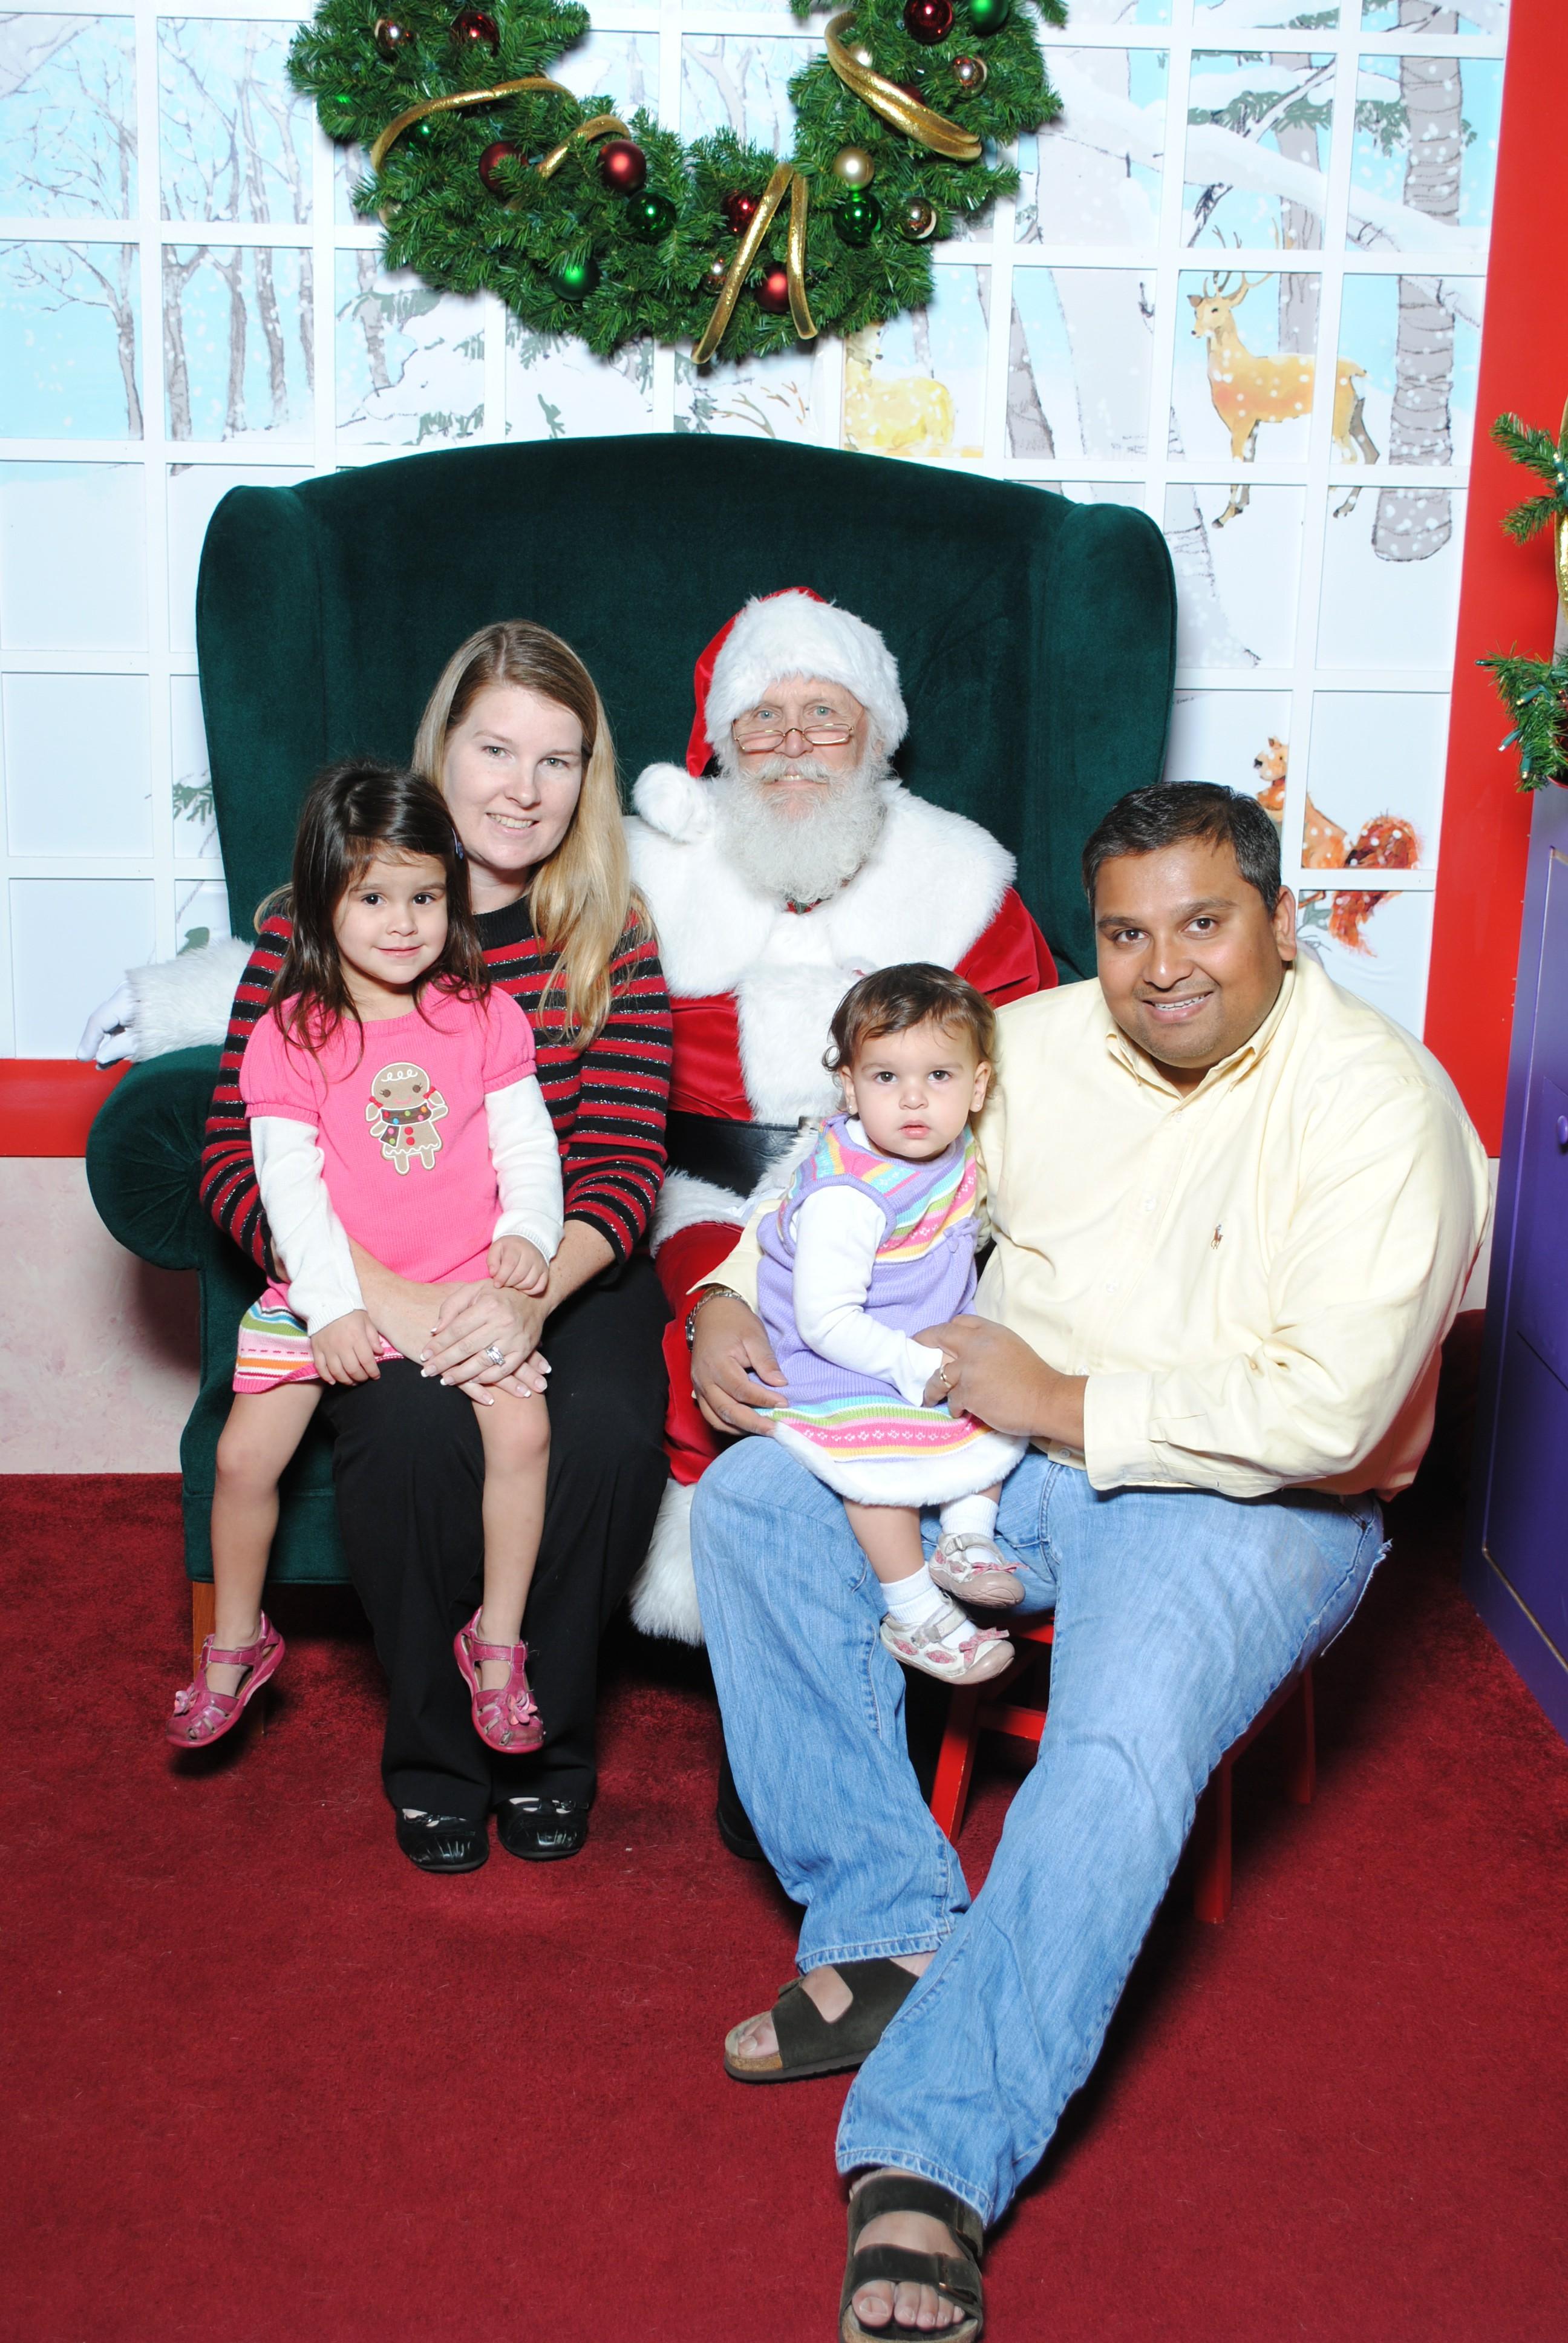 Wordless Wednesday: Visiting Santa